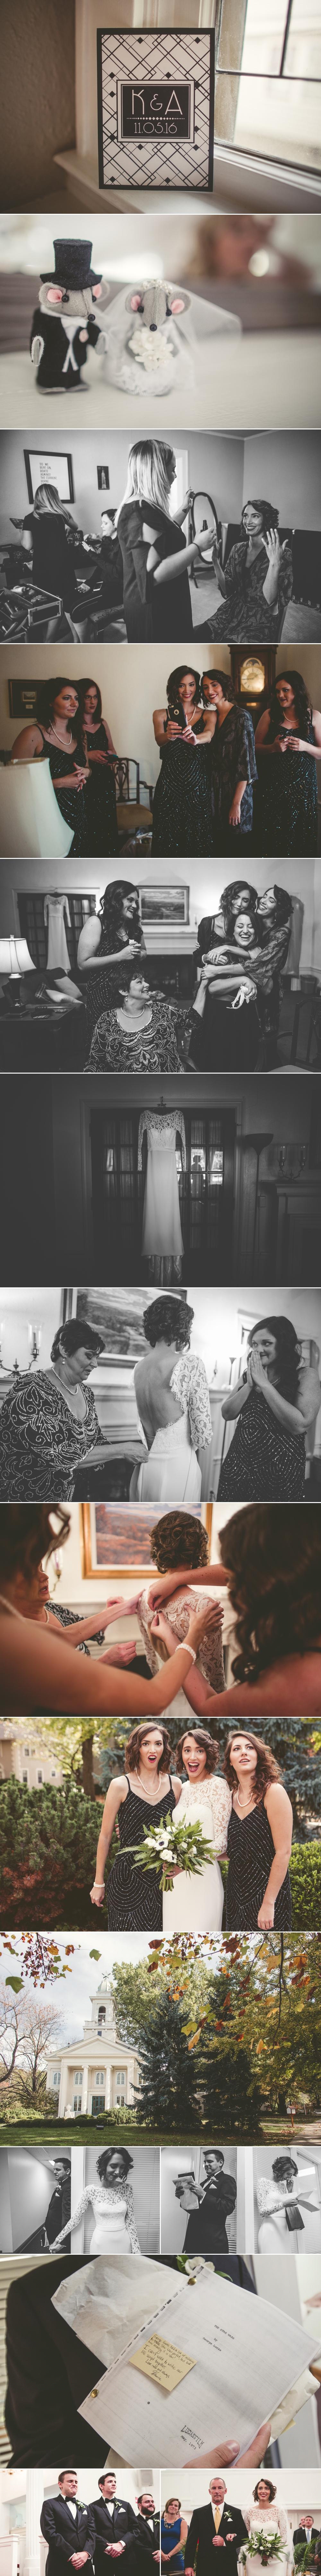 jason_domingues_photography_best_kansas_city_wedding_photographer_kc_weddings_berg0001